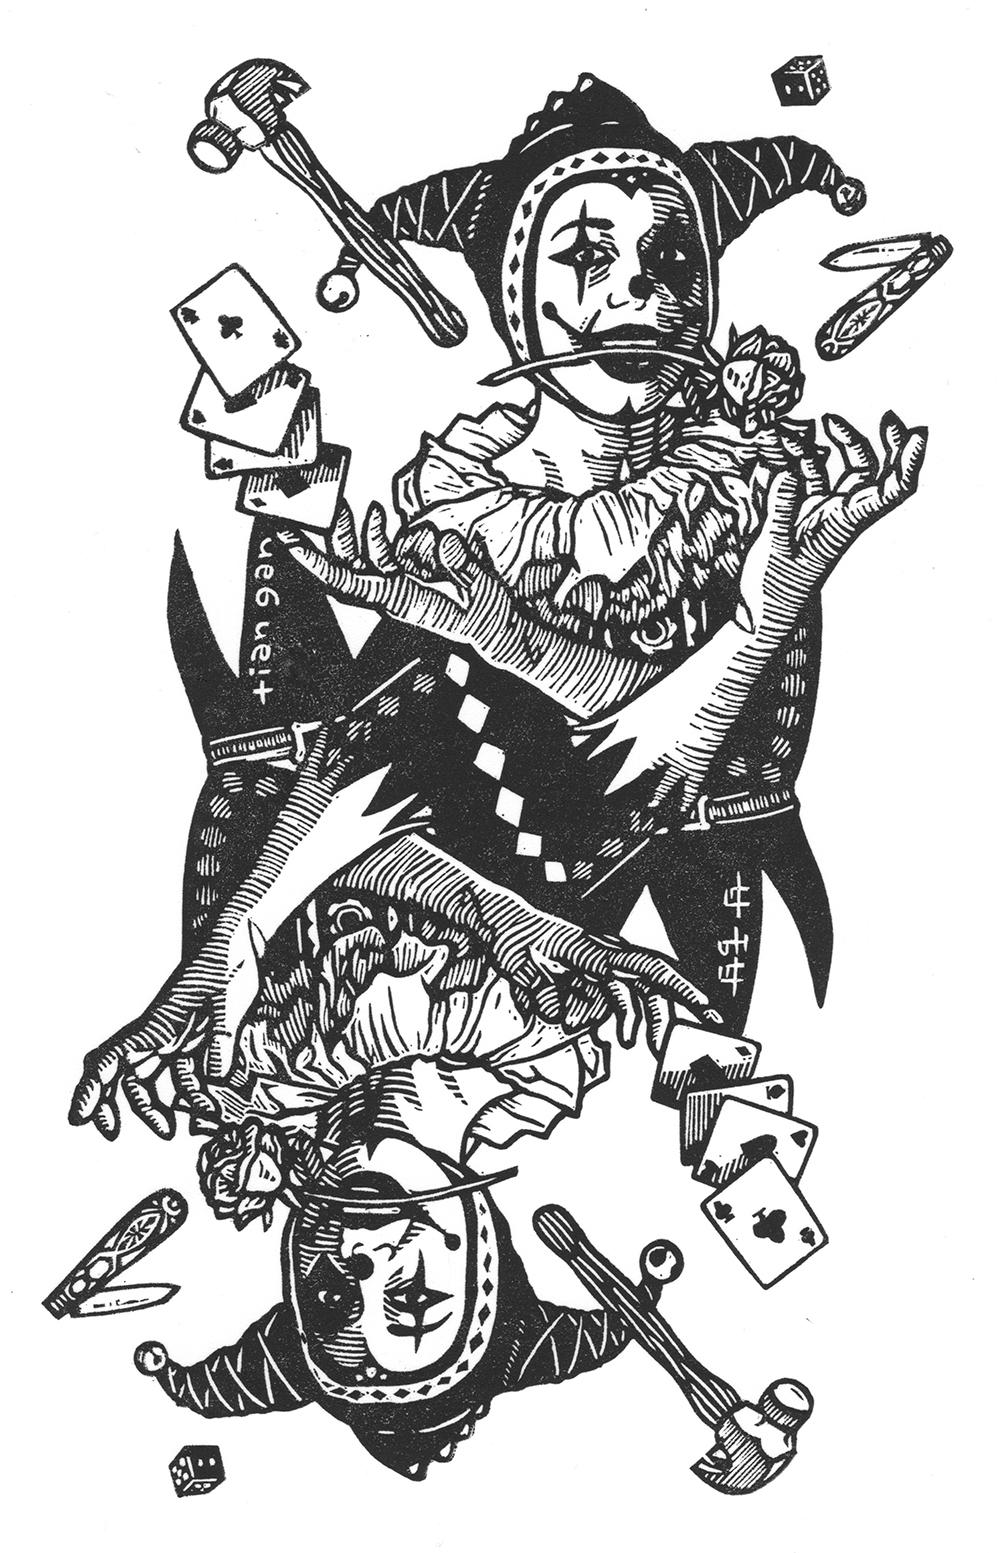 The joker design shows the artist's signature.